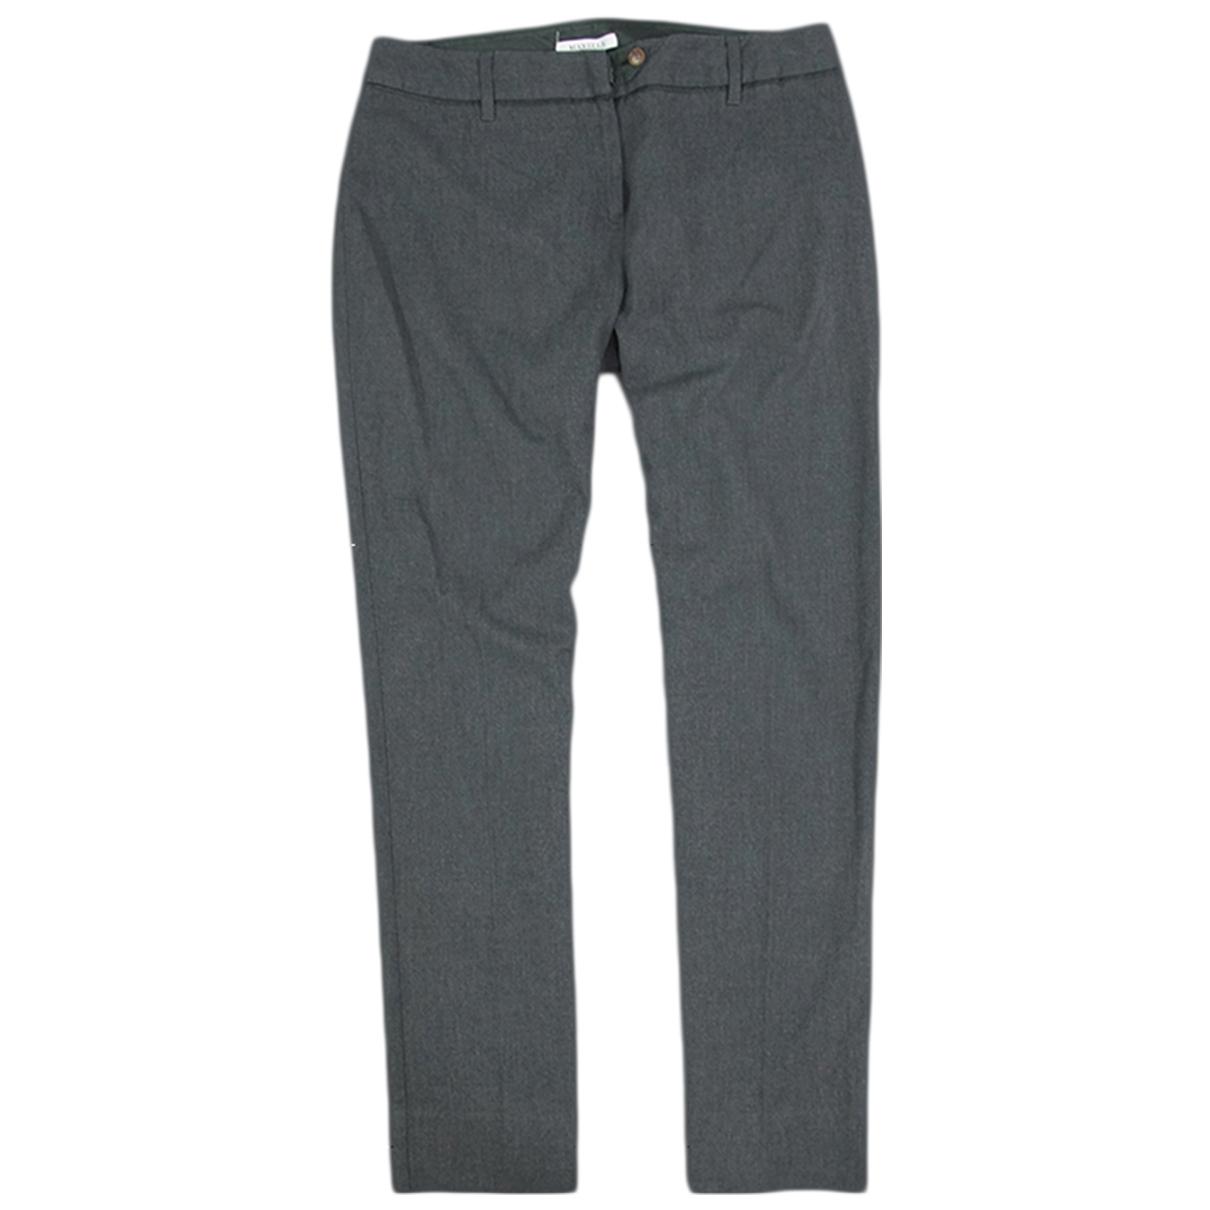 Marella \N Grey Trousers for Women L International